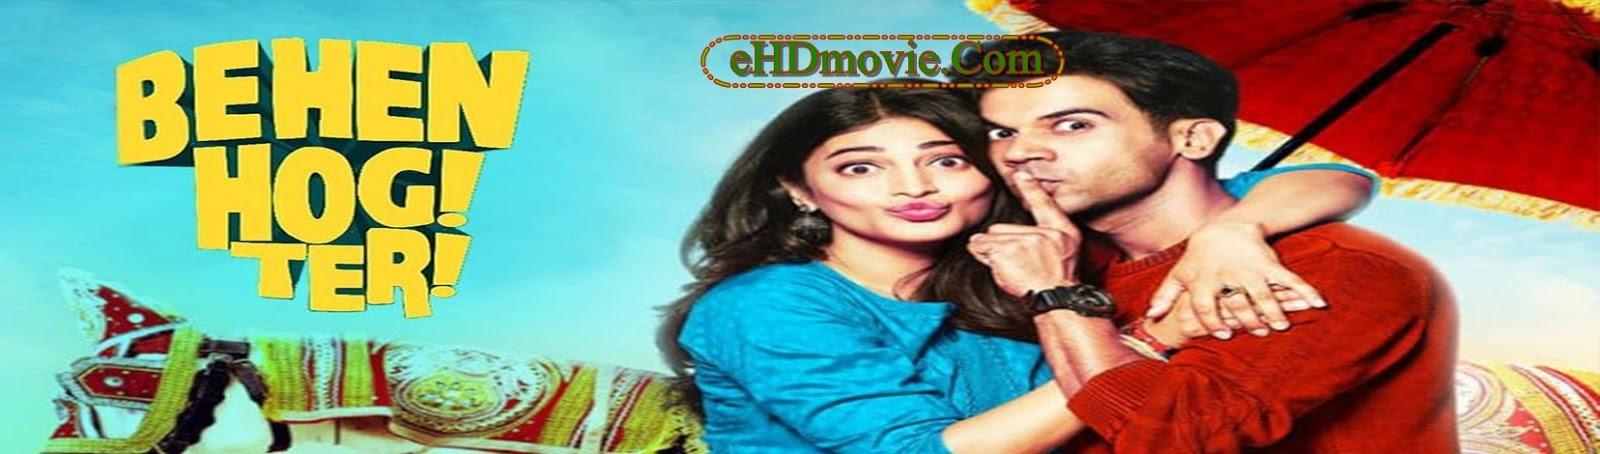 Behen Hogi Teri 2017 Full Movie Hindi 720p - 480p ORG BRRip 400MB - 1GB ESubs Free Download